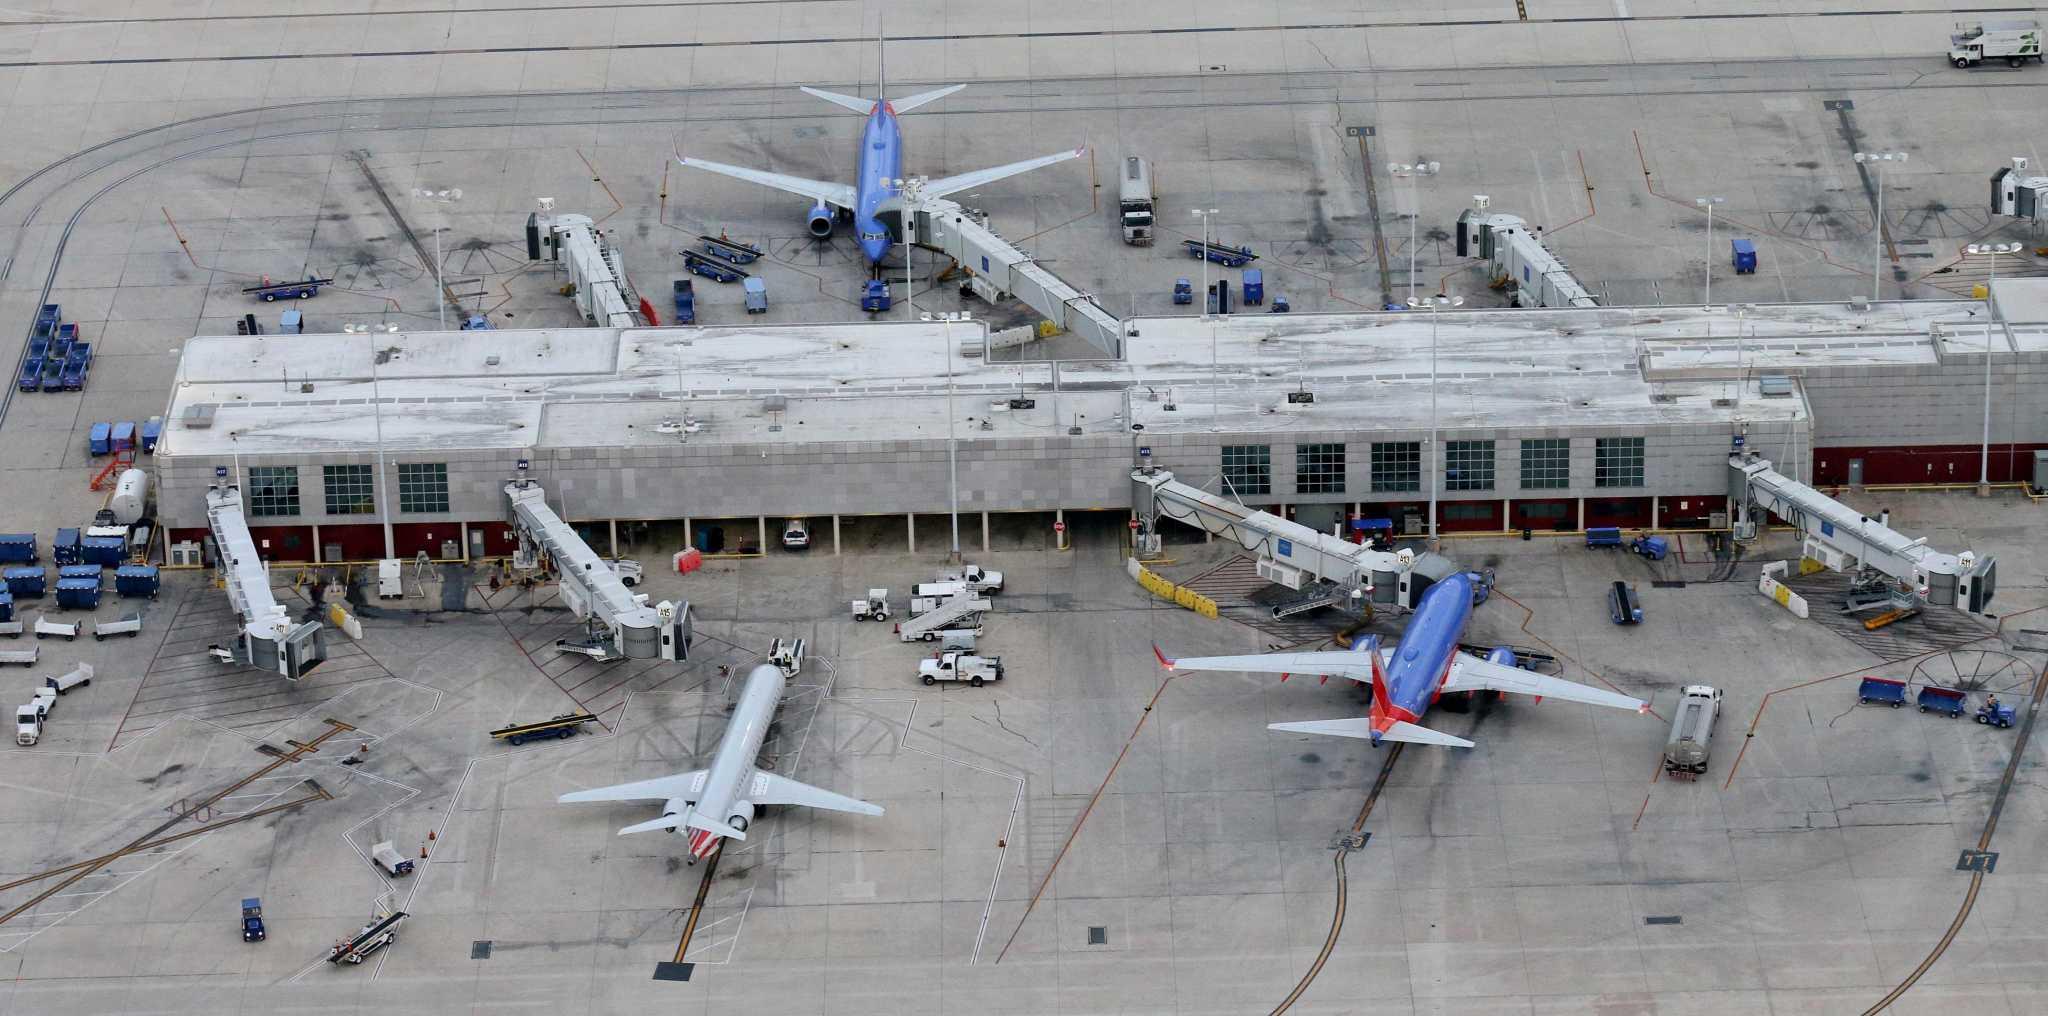 San Antonio airport saw record passenger traffic in 2018 - more than 10 million